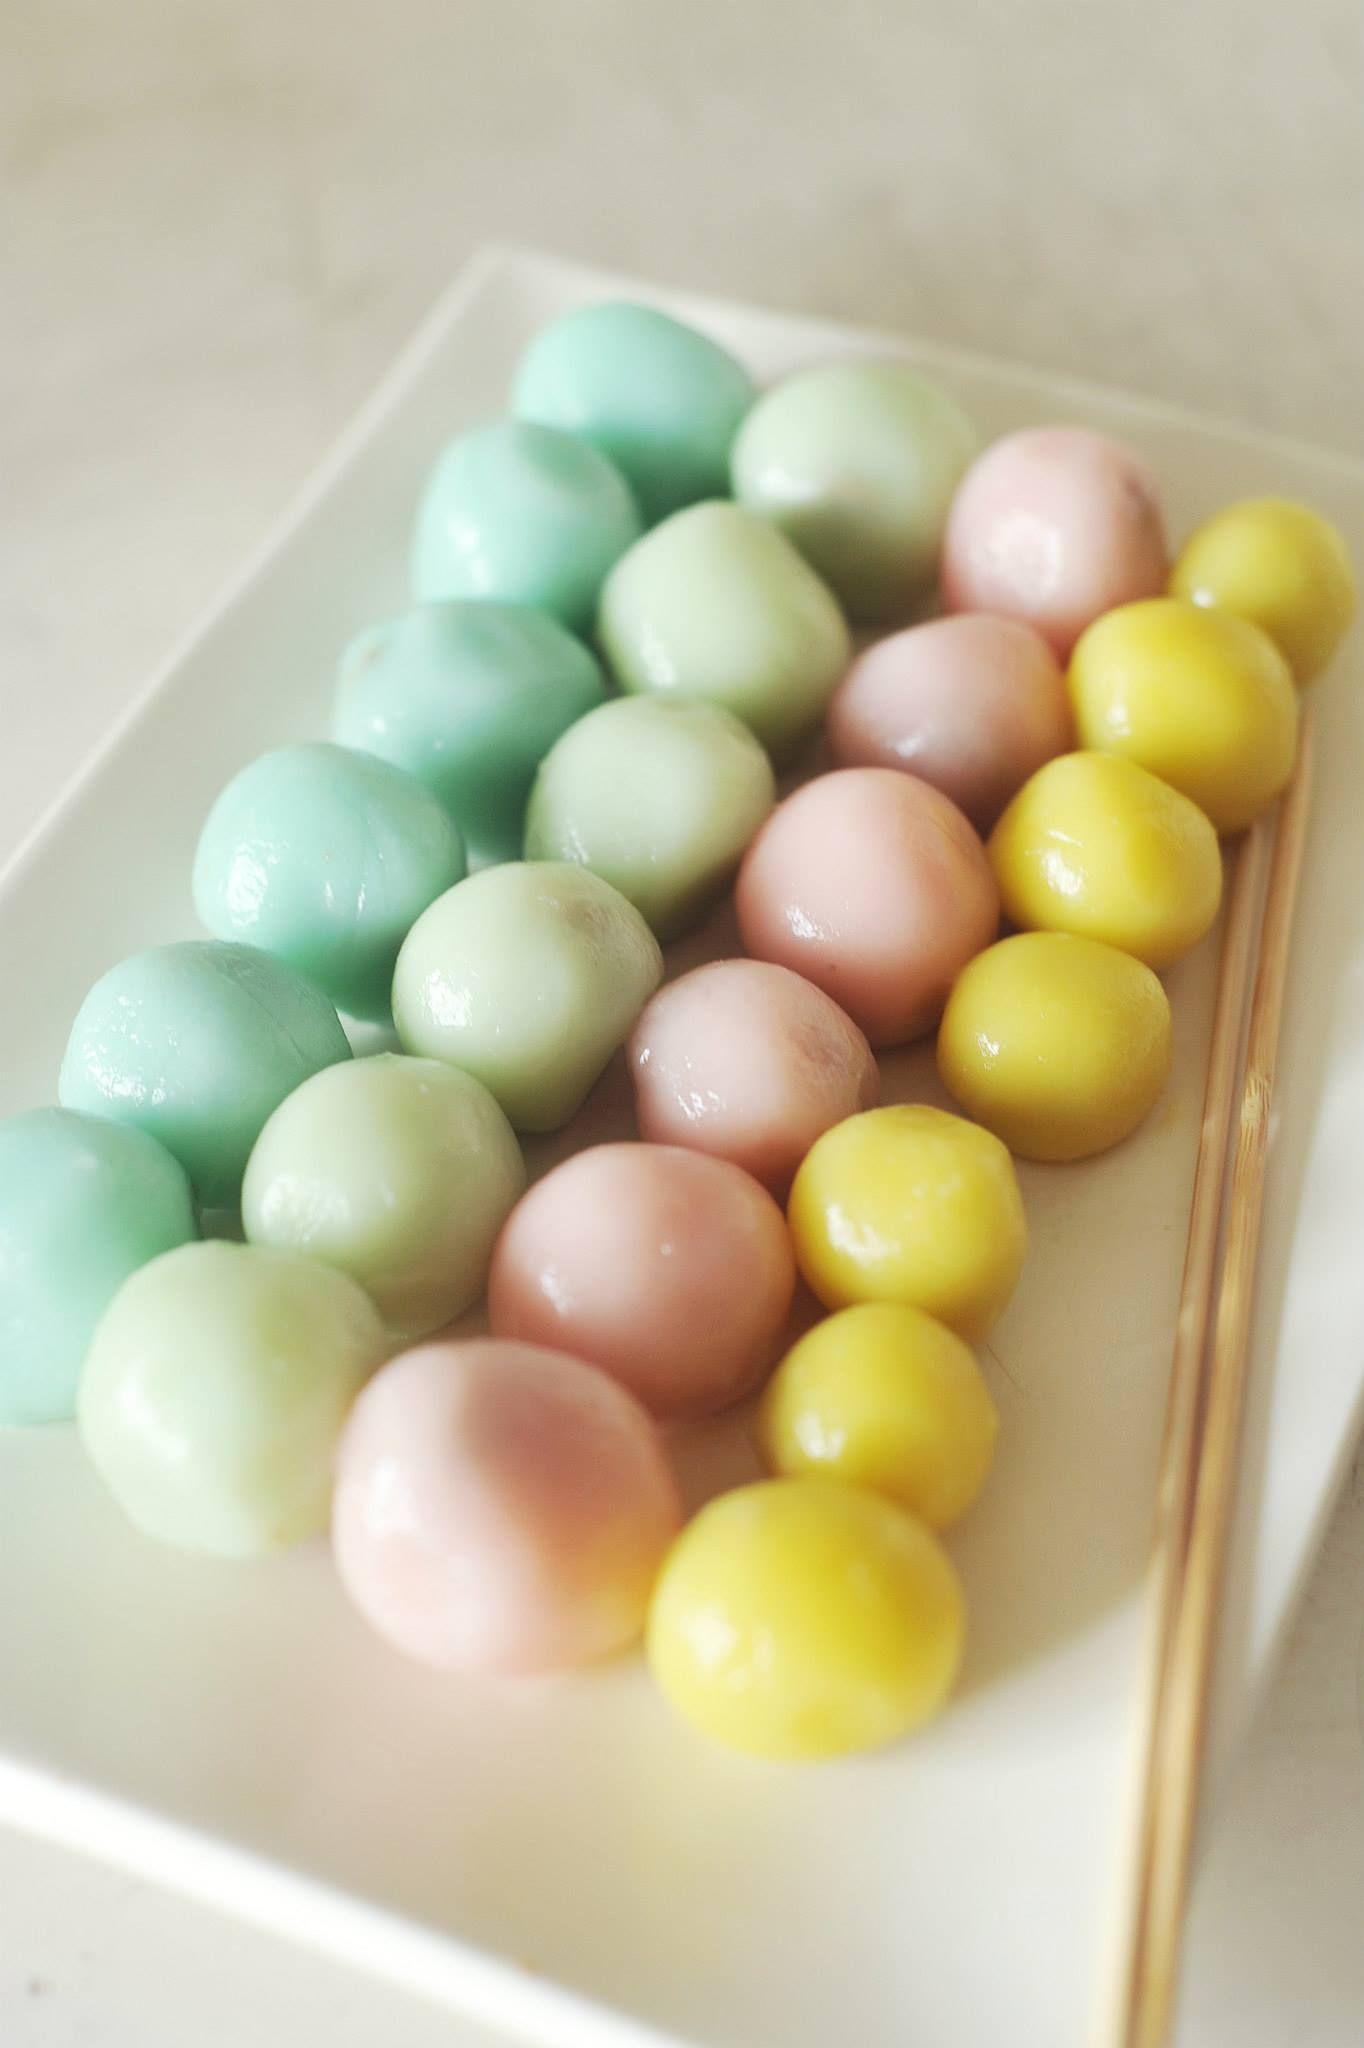 We also trued making japanese dango for dessert ) My